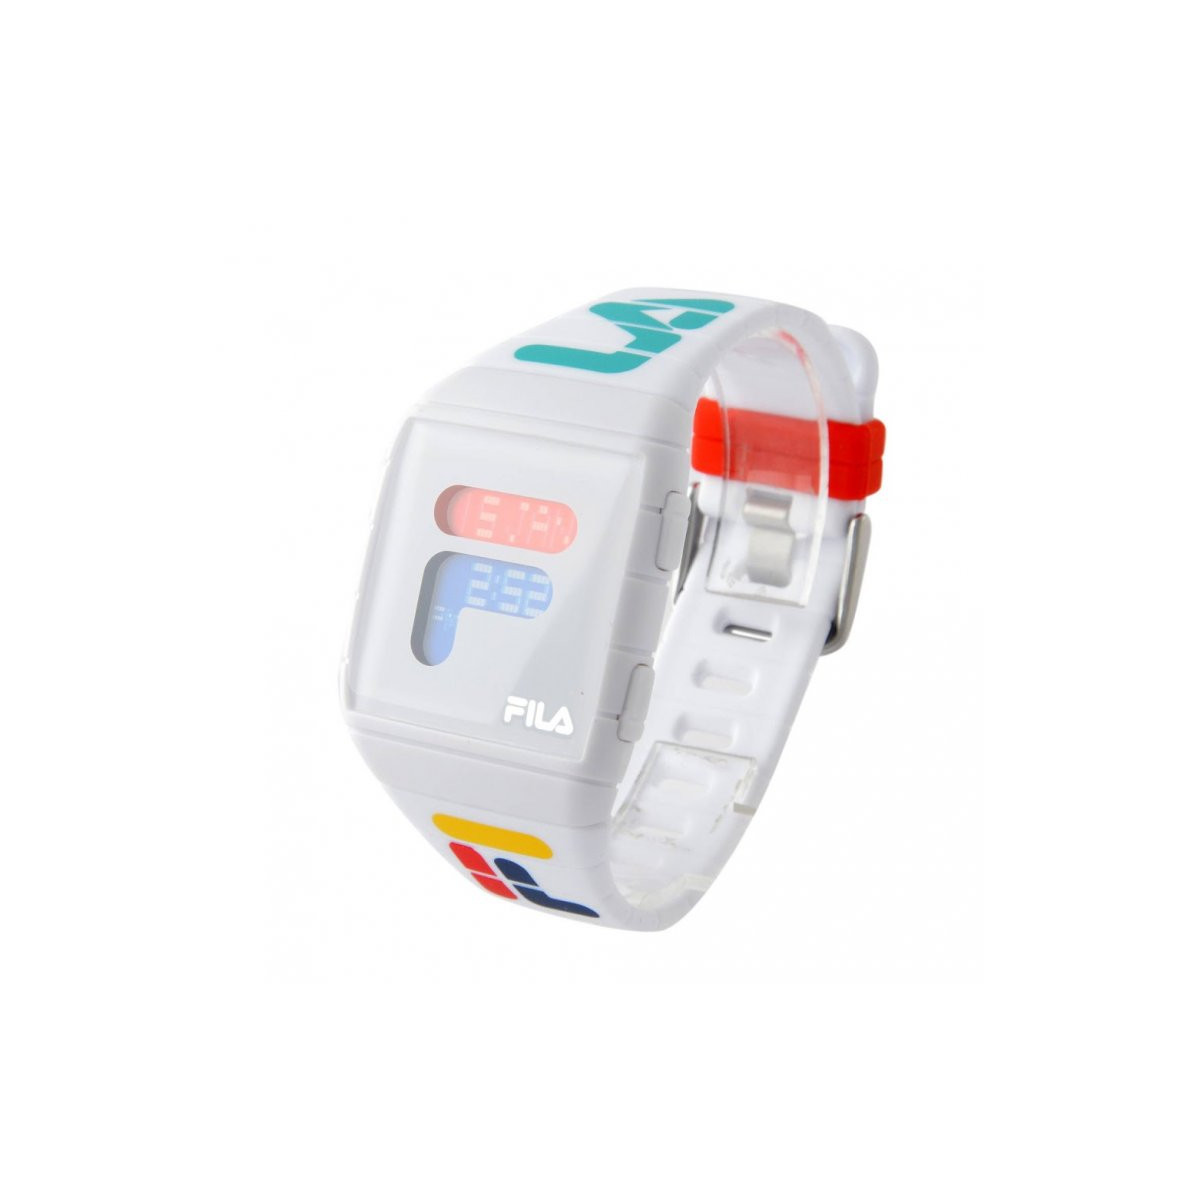 Montre mixte FILA digital cadran blanc - 38-105-007